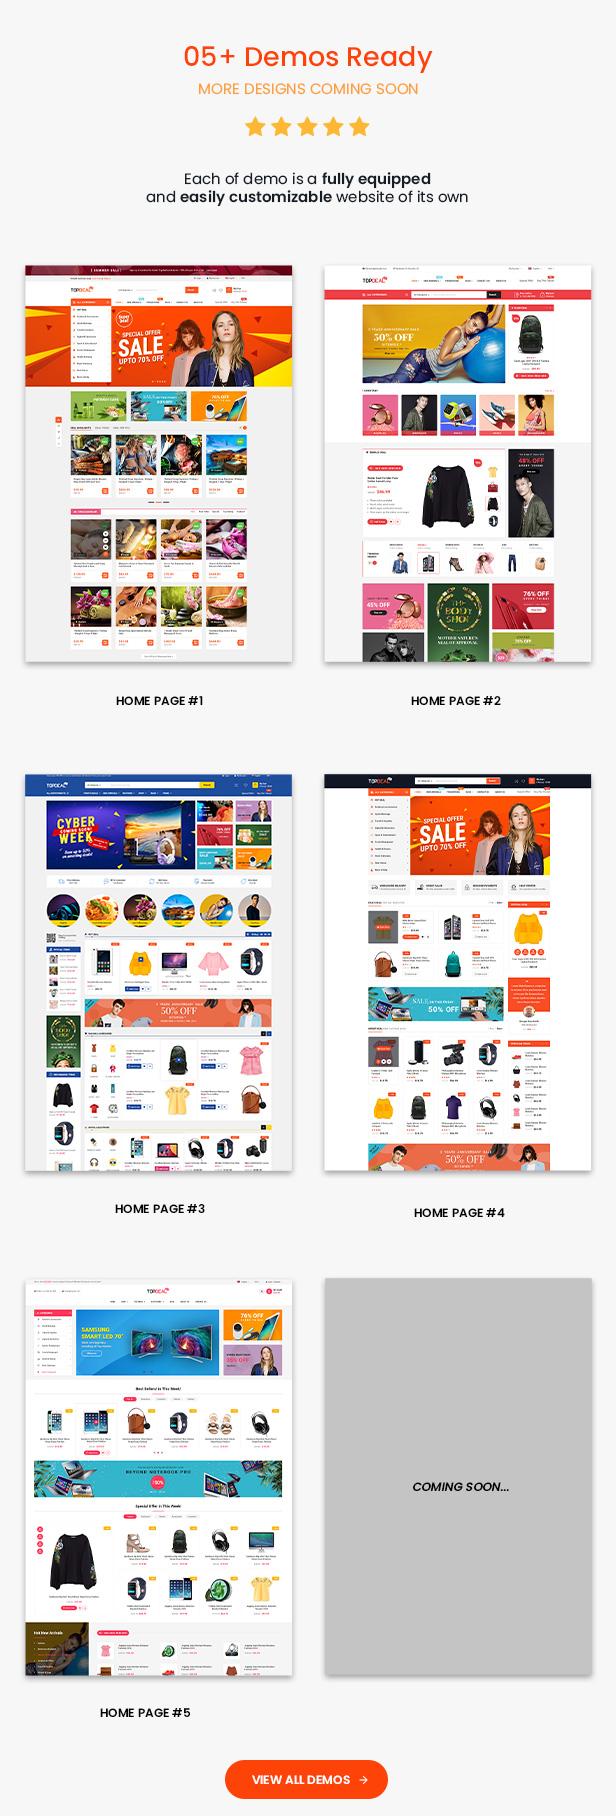 TopDeal - Top Trending Multi Vendor Marketplace WordPress Theme